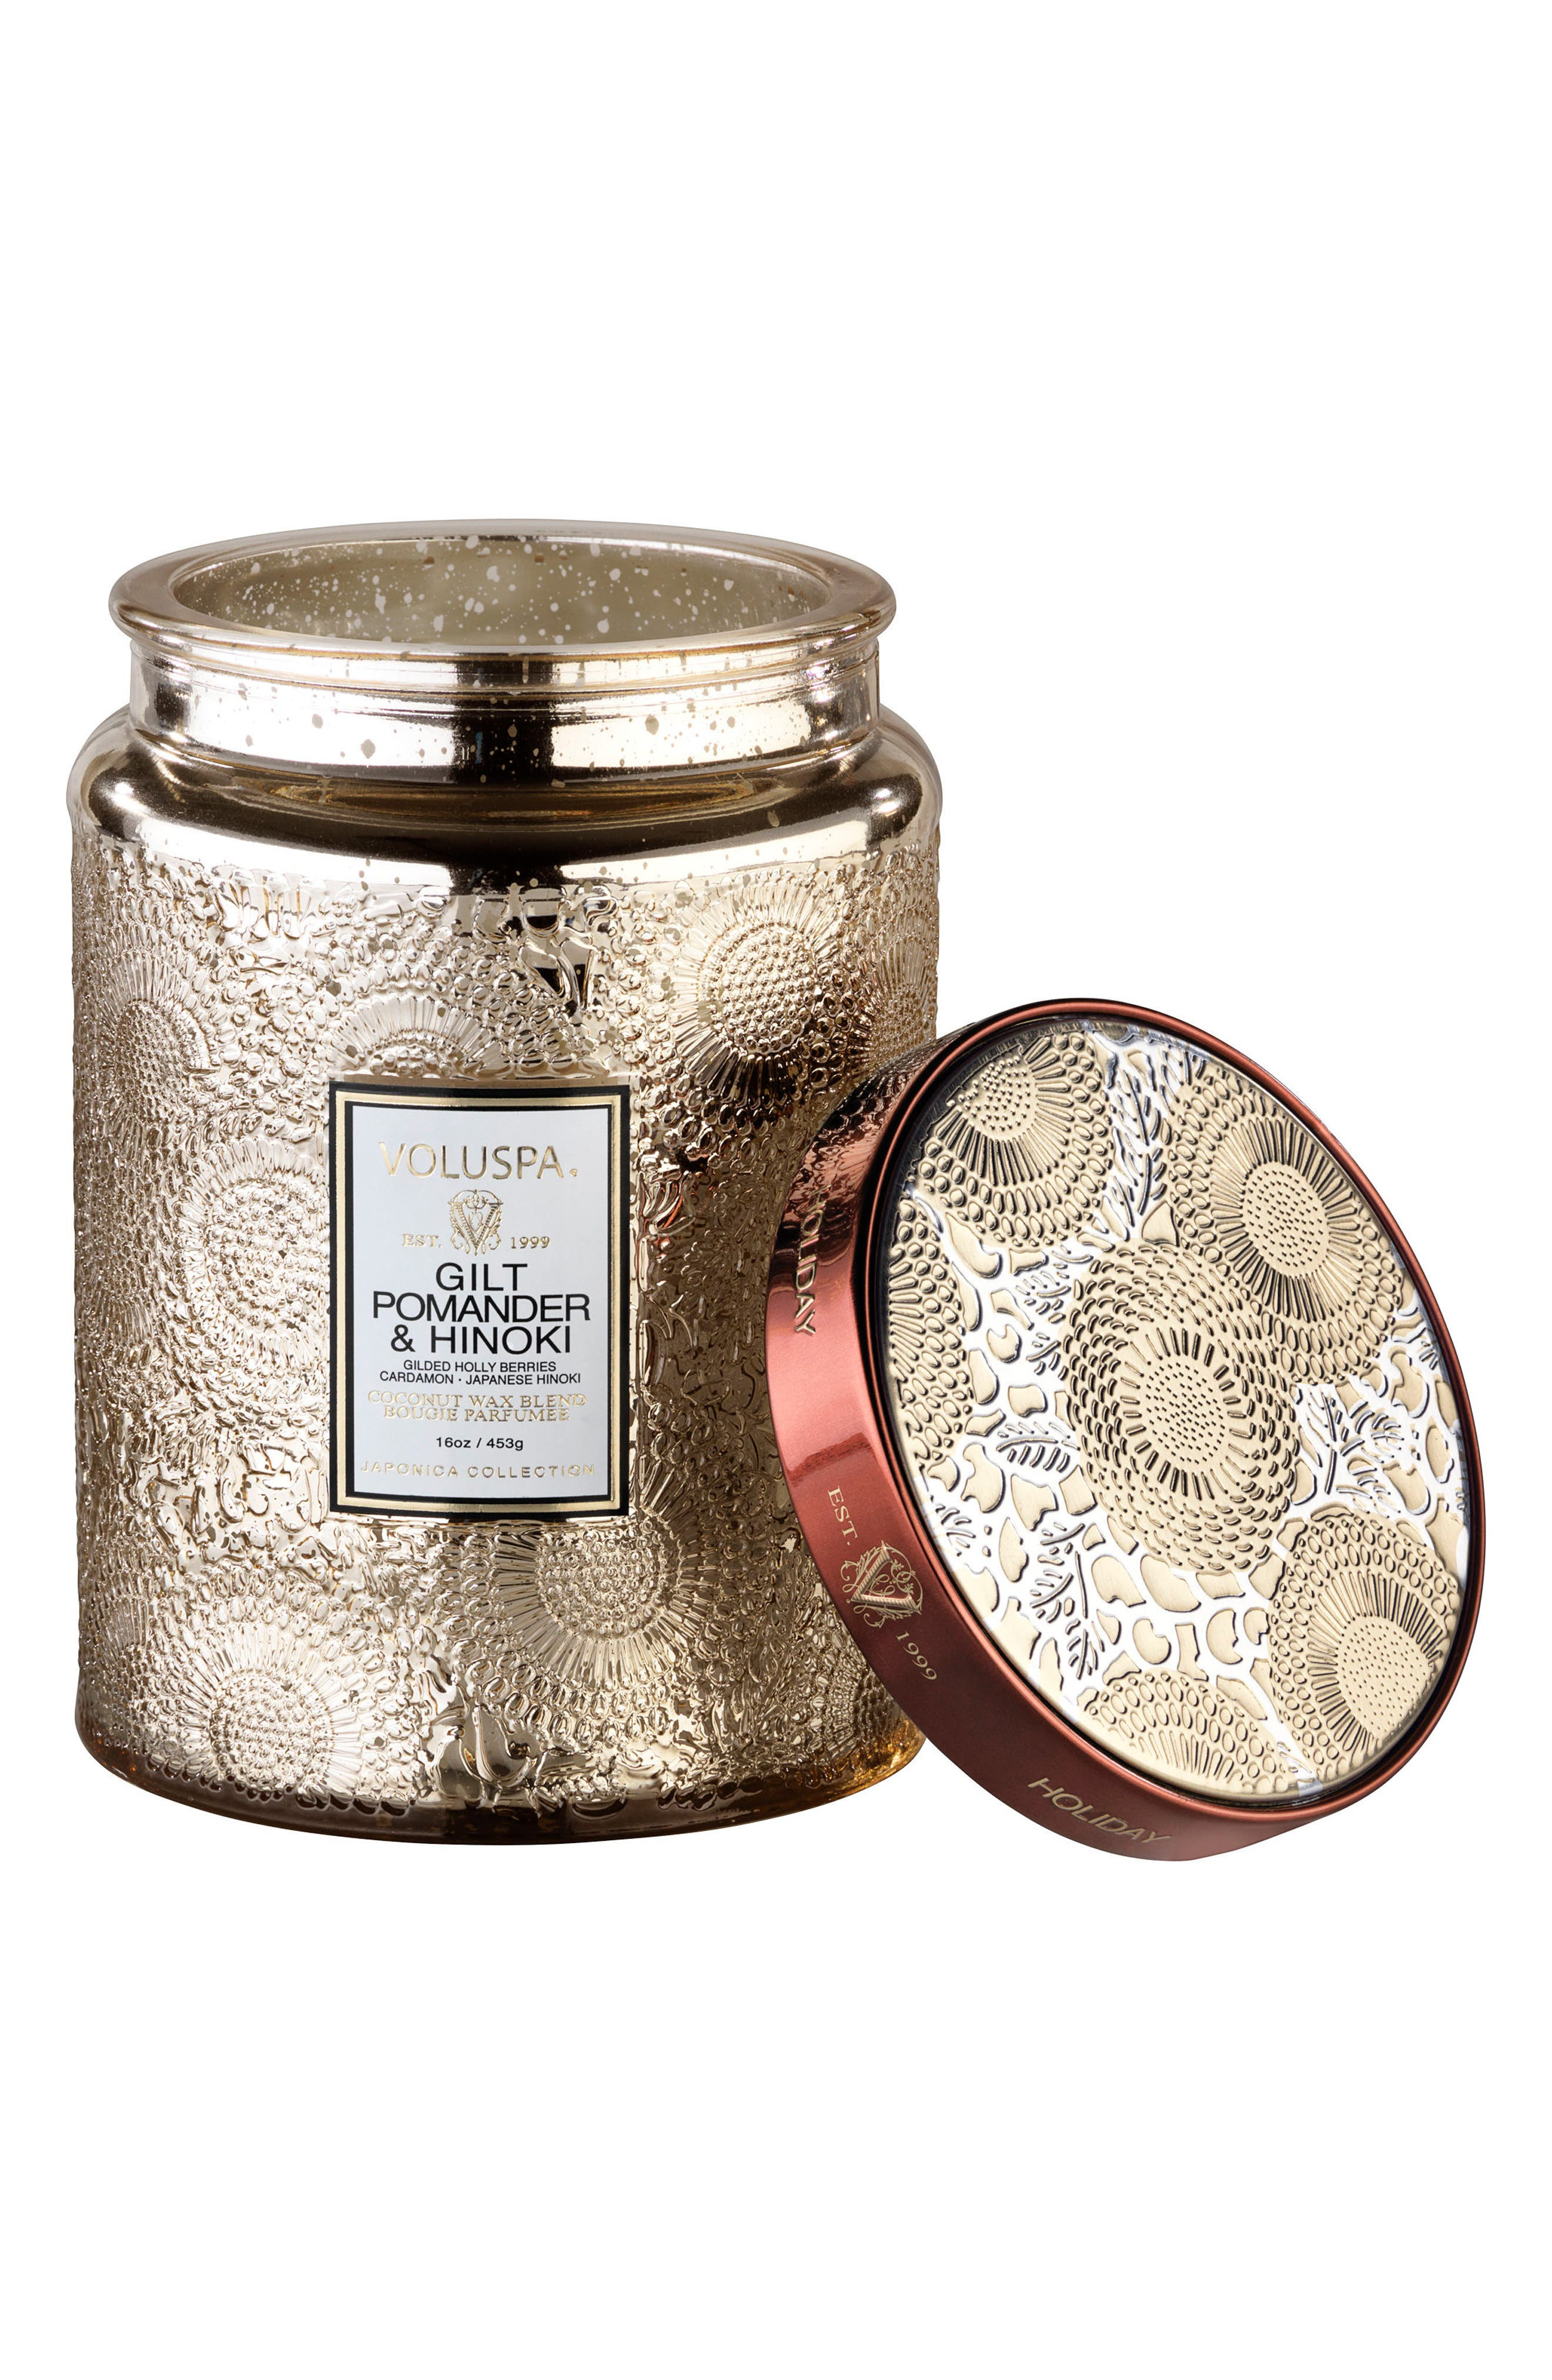 Voluspa Gilt Pomander & Hinoki Large Glass Jar Candle